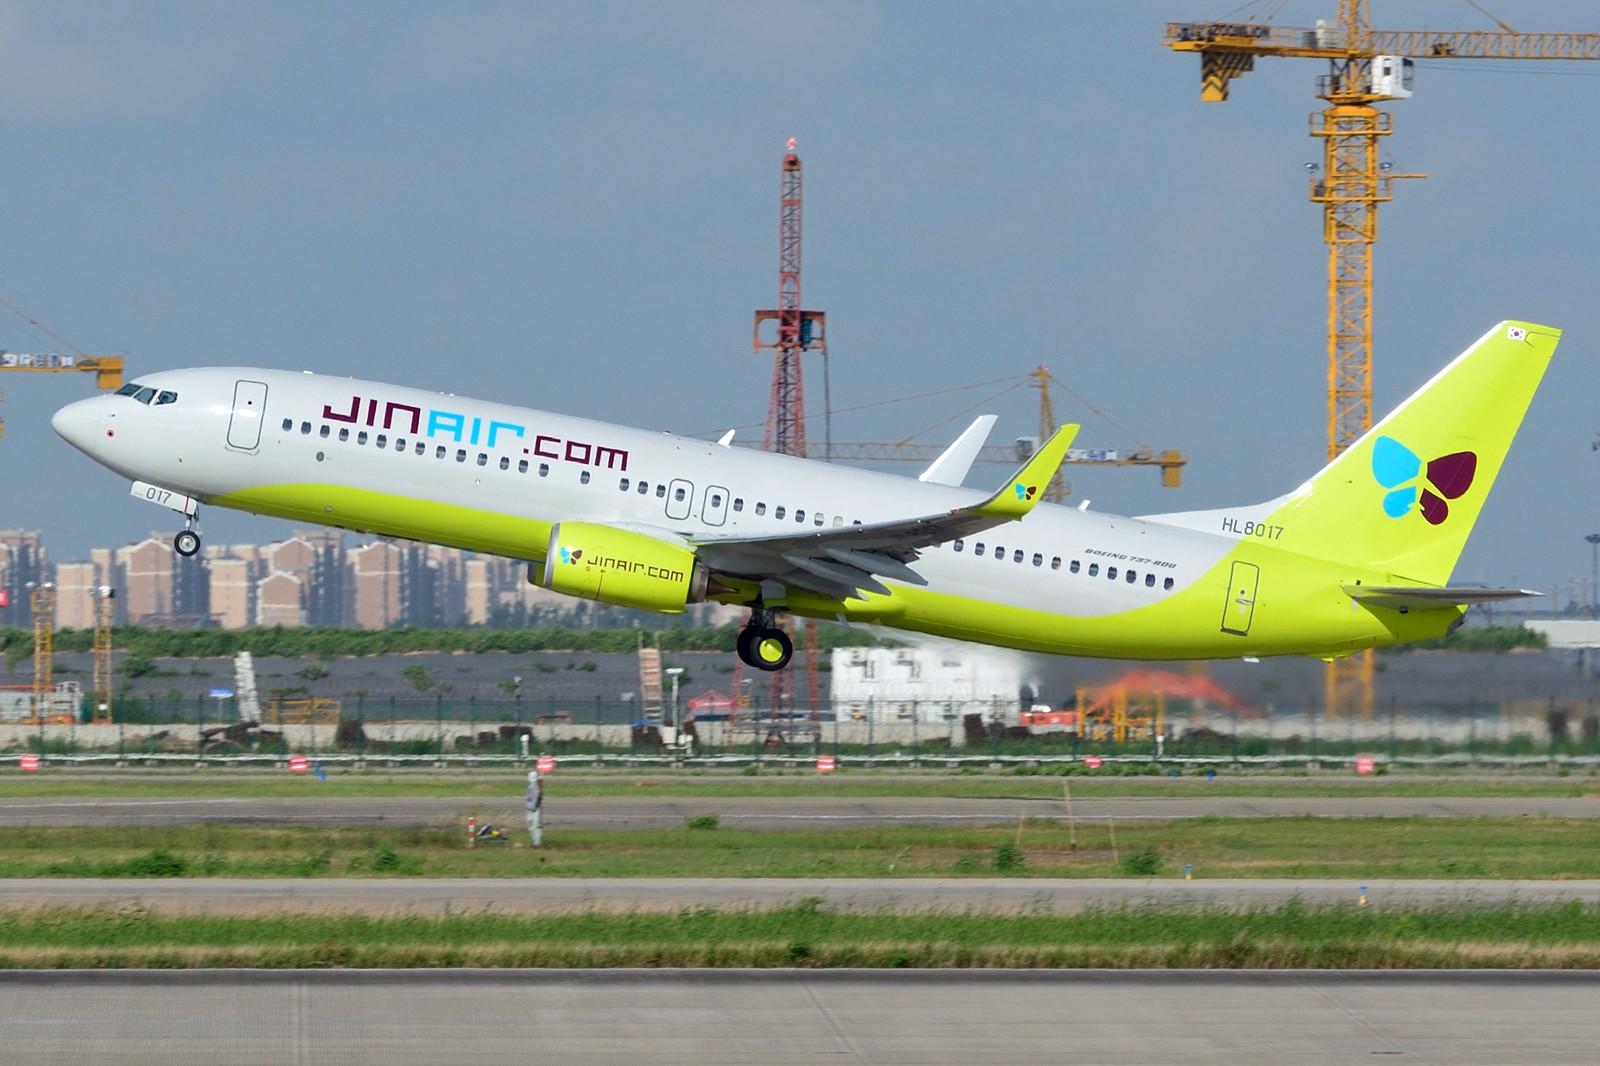 Re:[原创]【PVG】夏日东跑一组~~ BOEING 737-800 HL8017 中国上海浦东国际机场